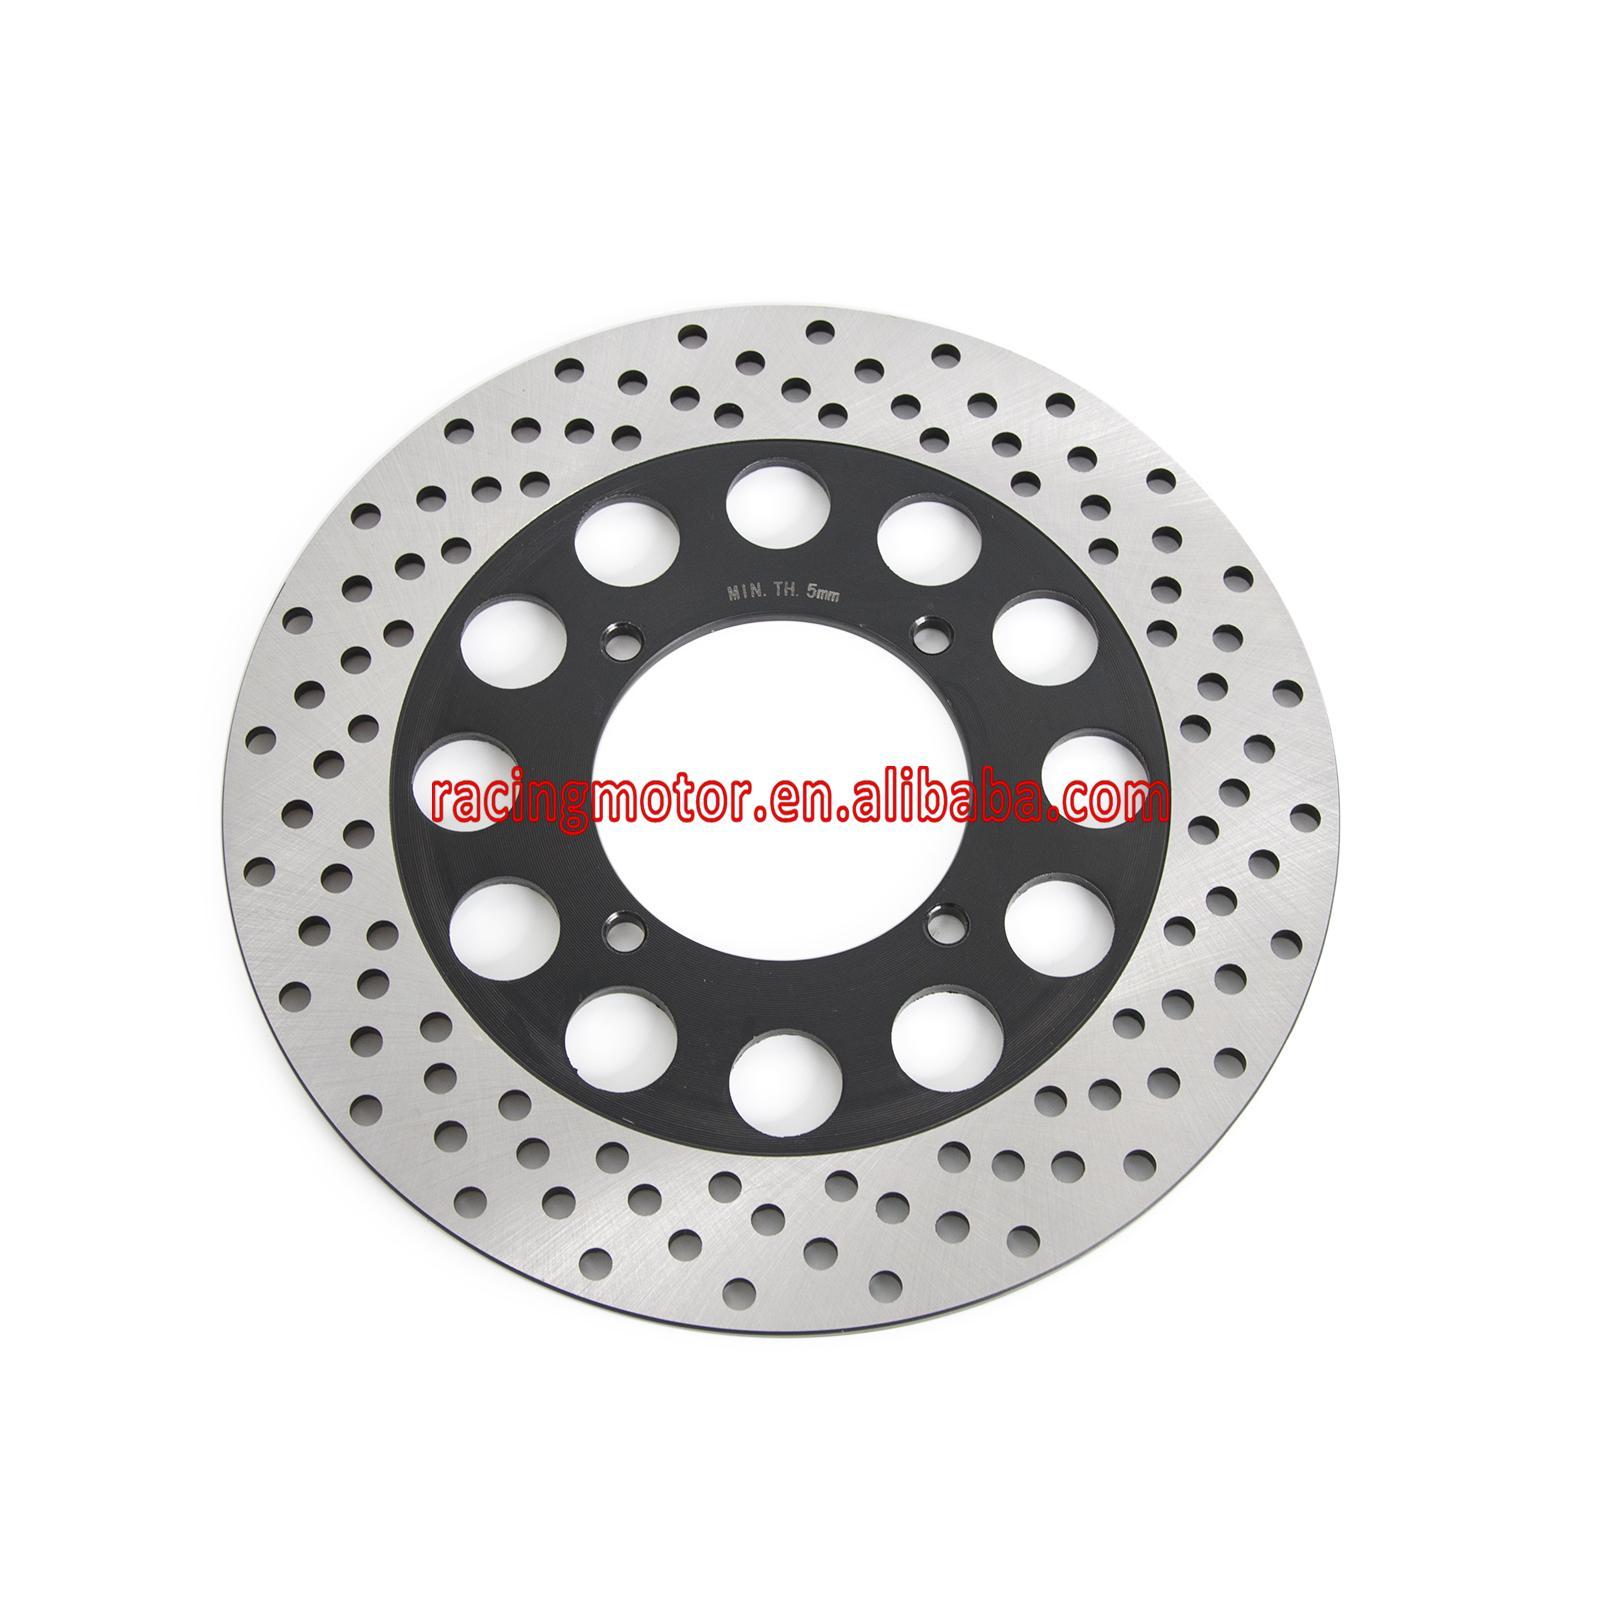 Rear Brake Disc Rotor Steel Fits For Suzuki GSF 250 N/ZM/P/NP/ZP/R/NR 92-96